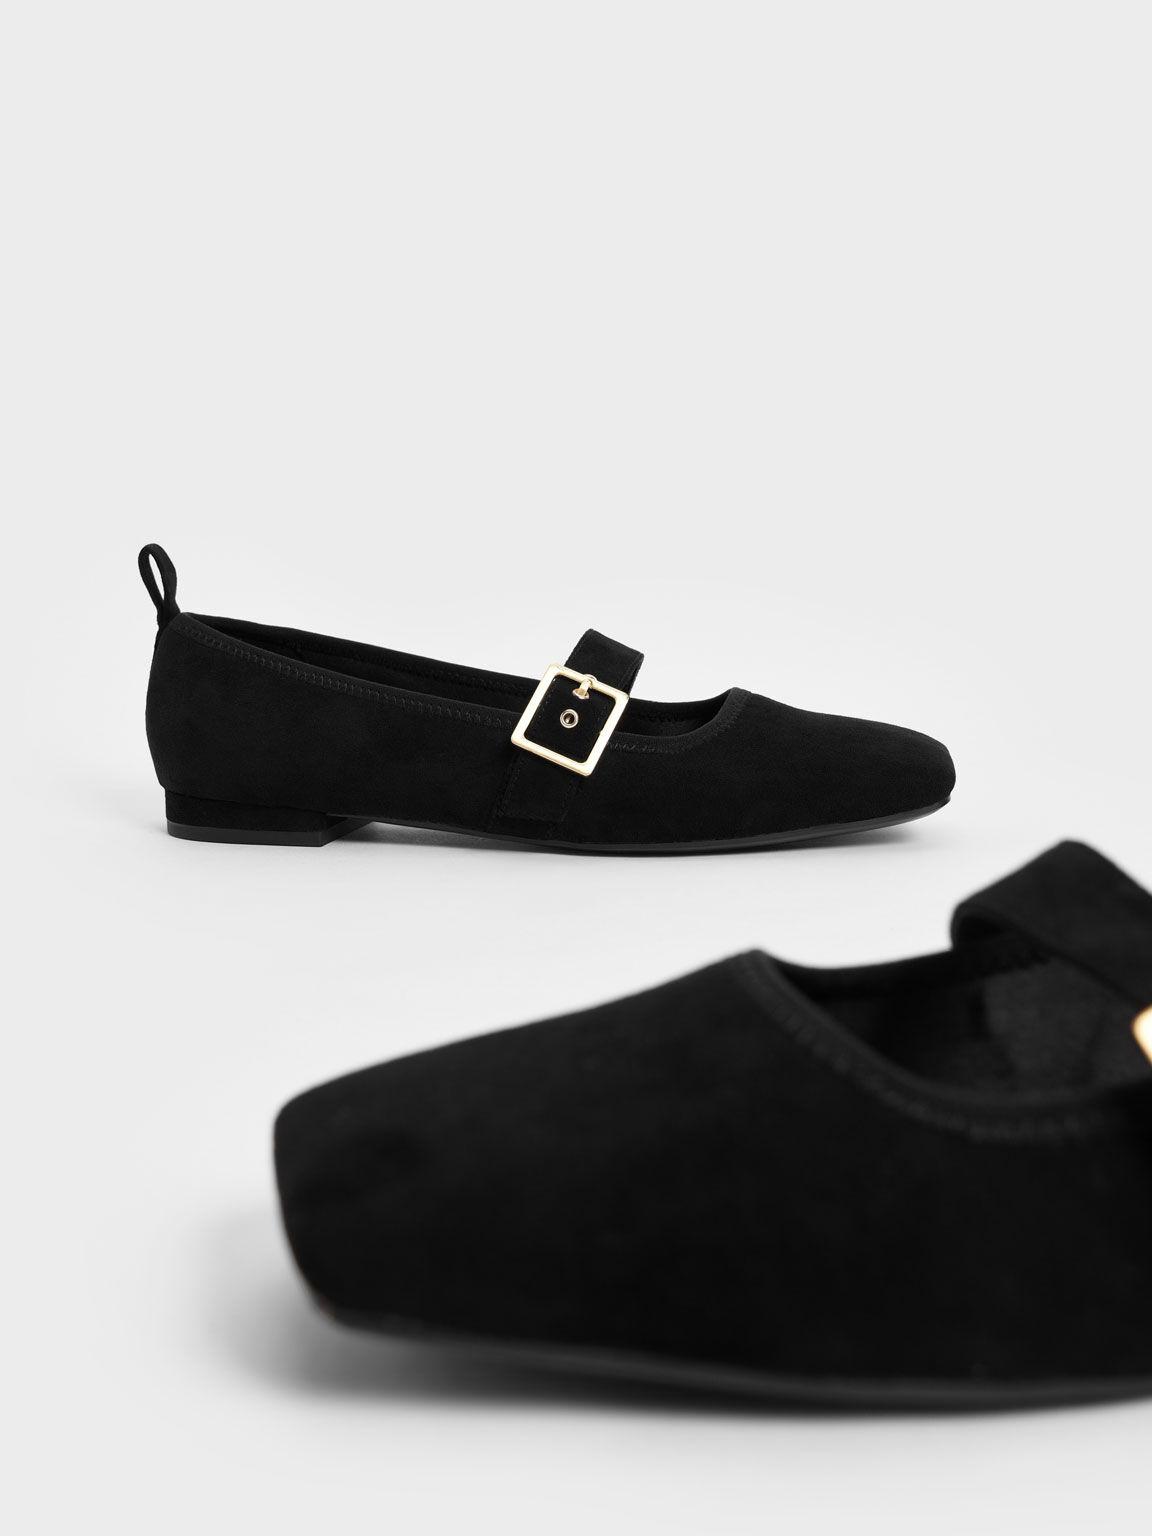 Textured Square Toe Mary Jane Flats, Black, hi-res